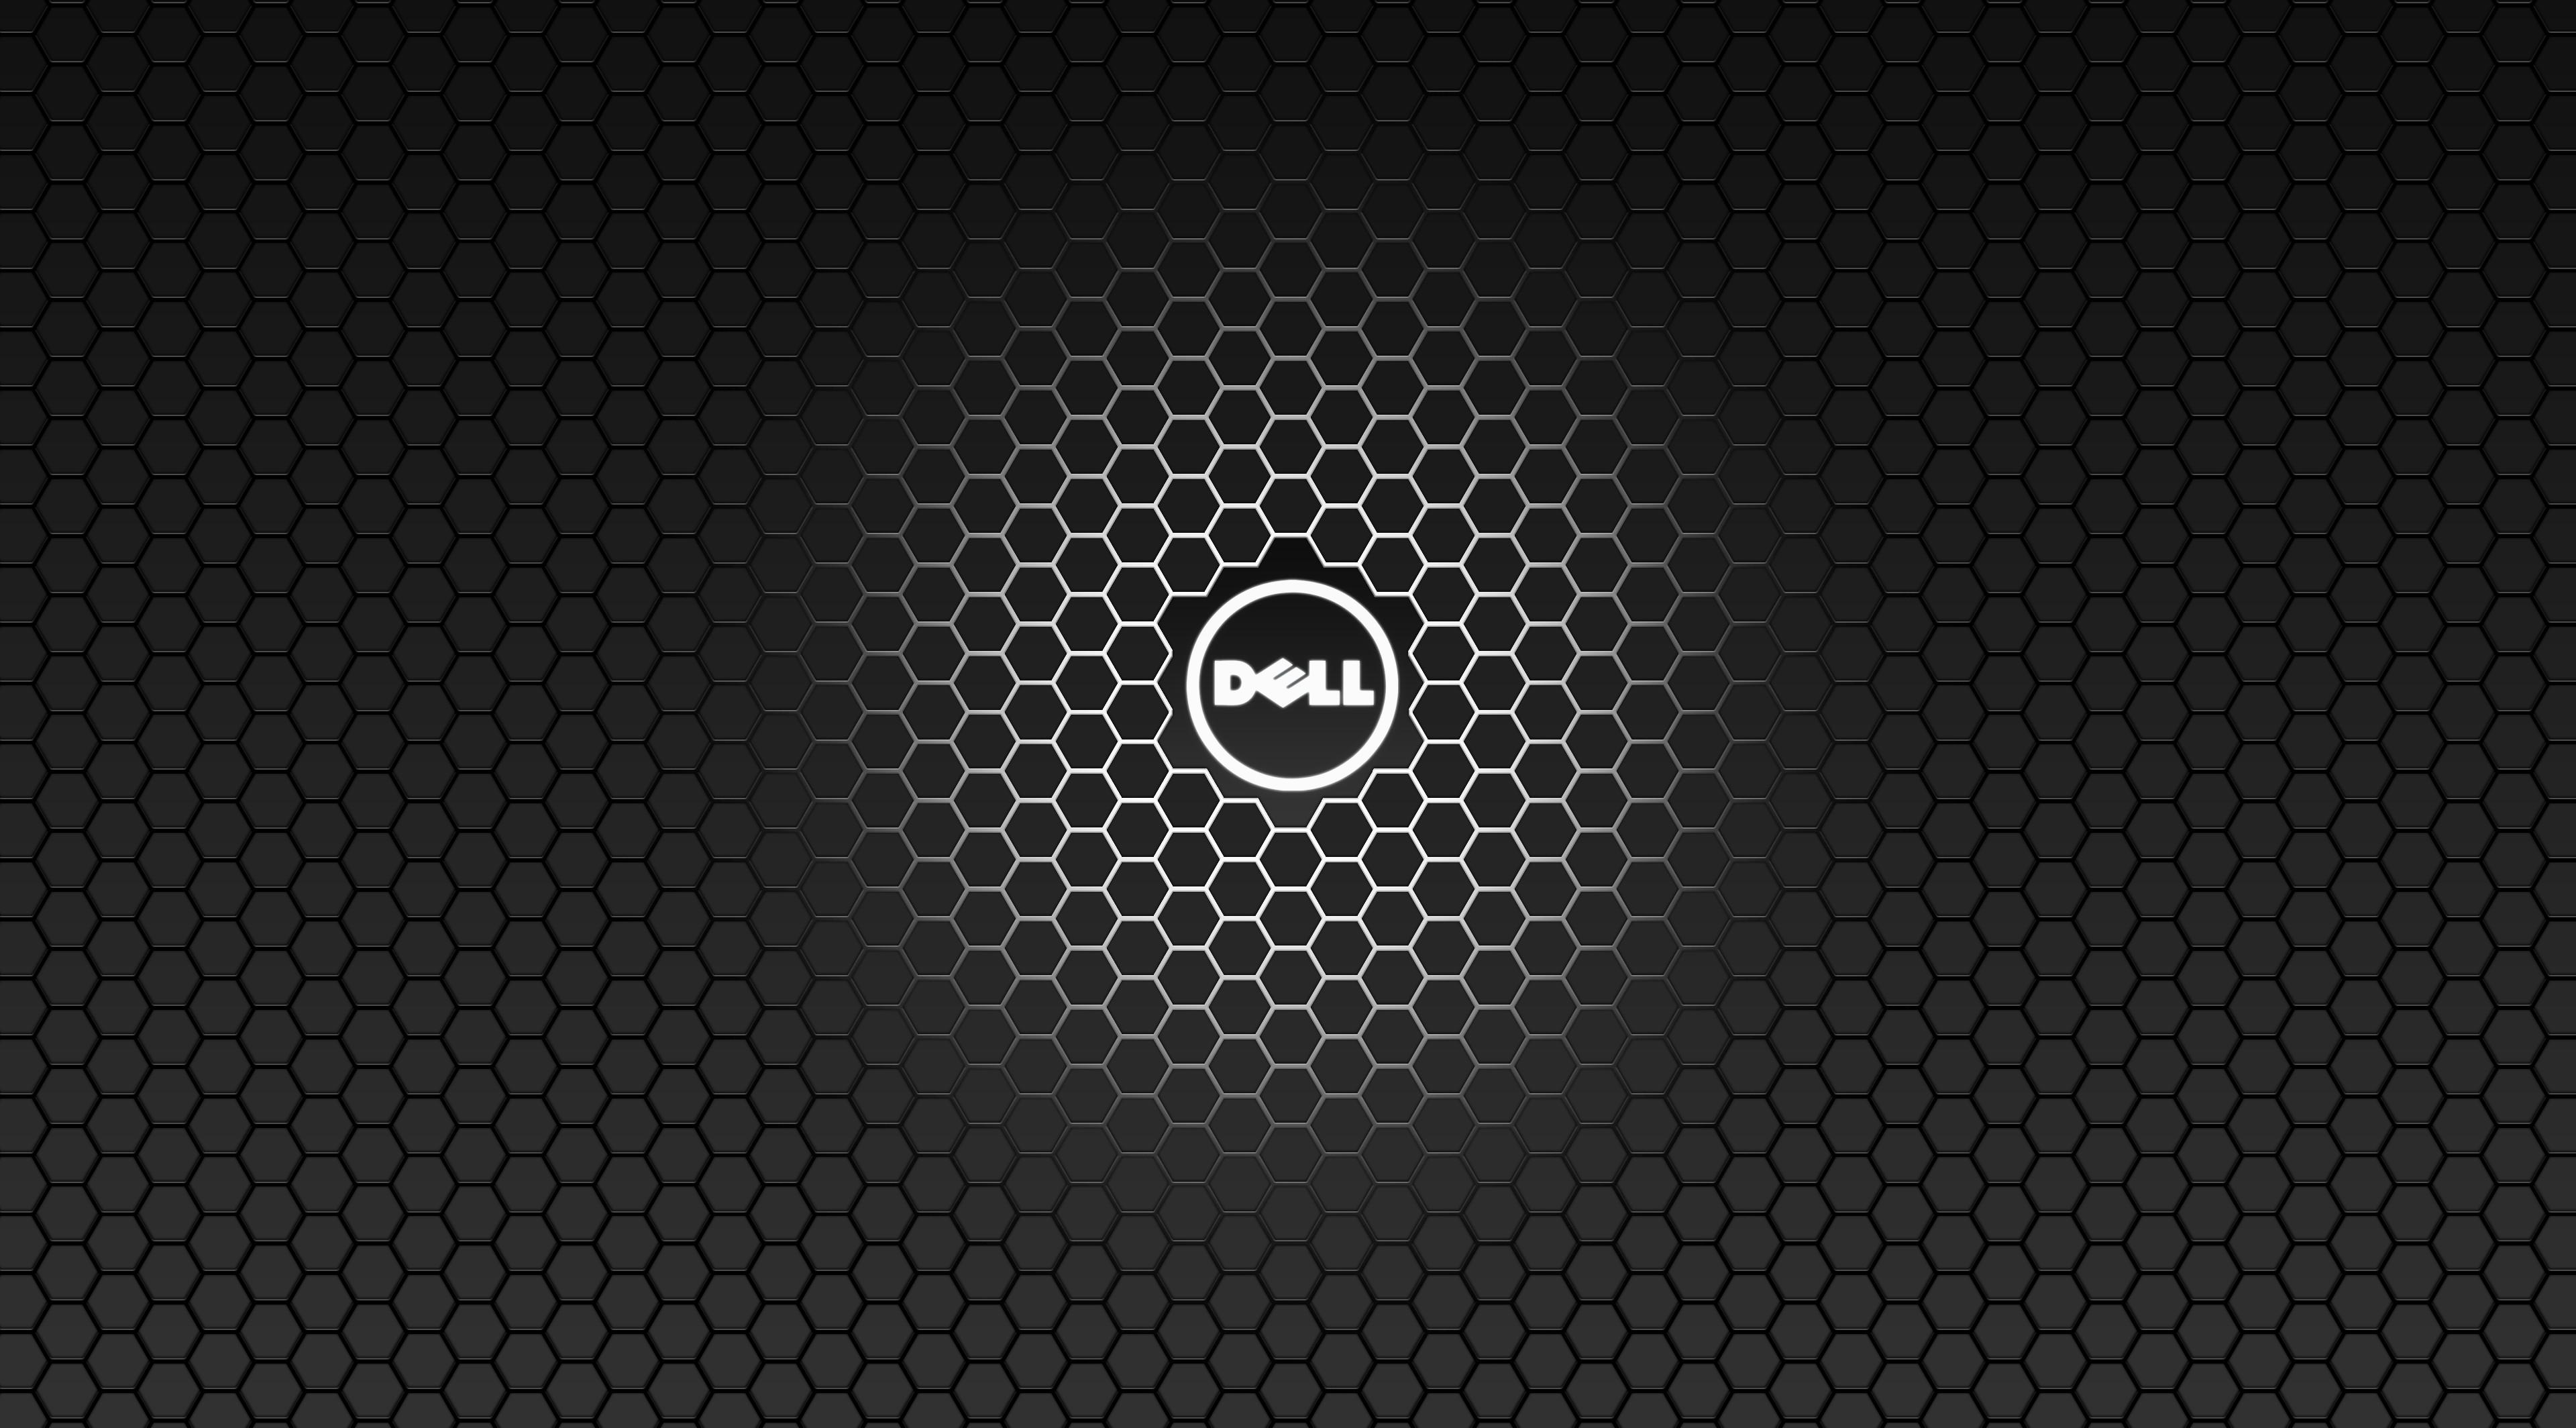 Technology – Dell Black Hexagon Wallpaper